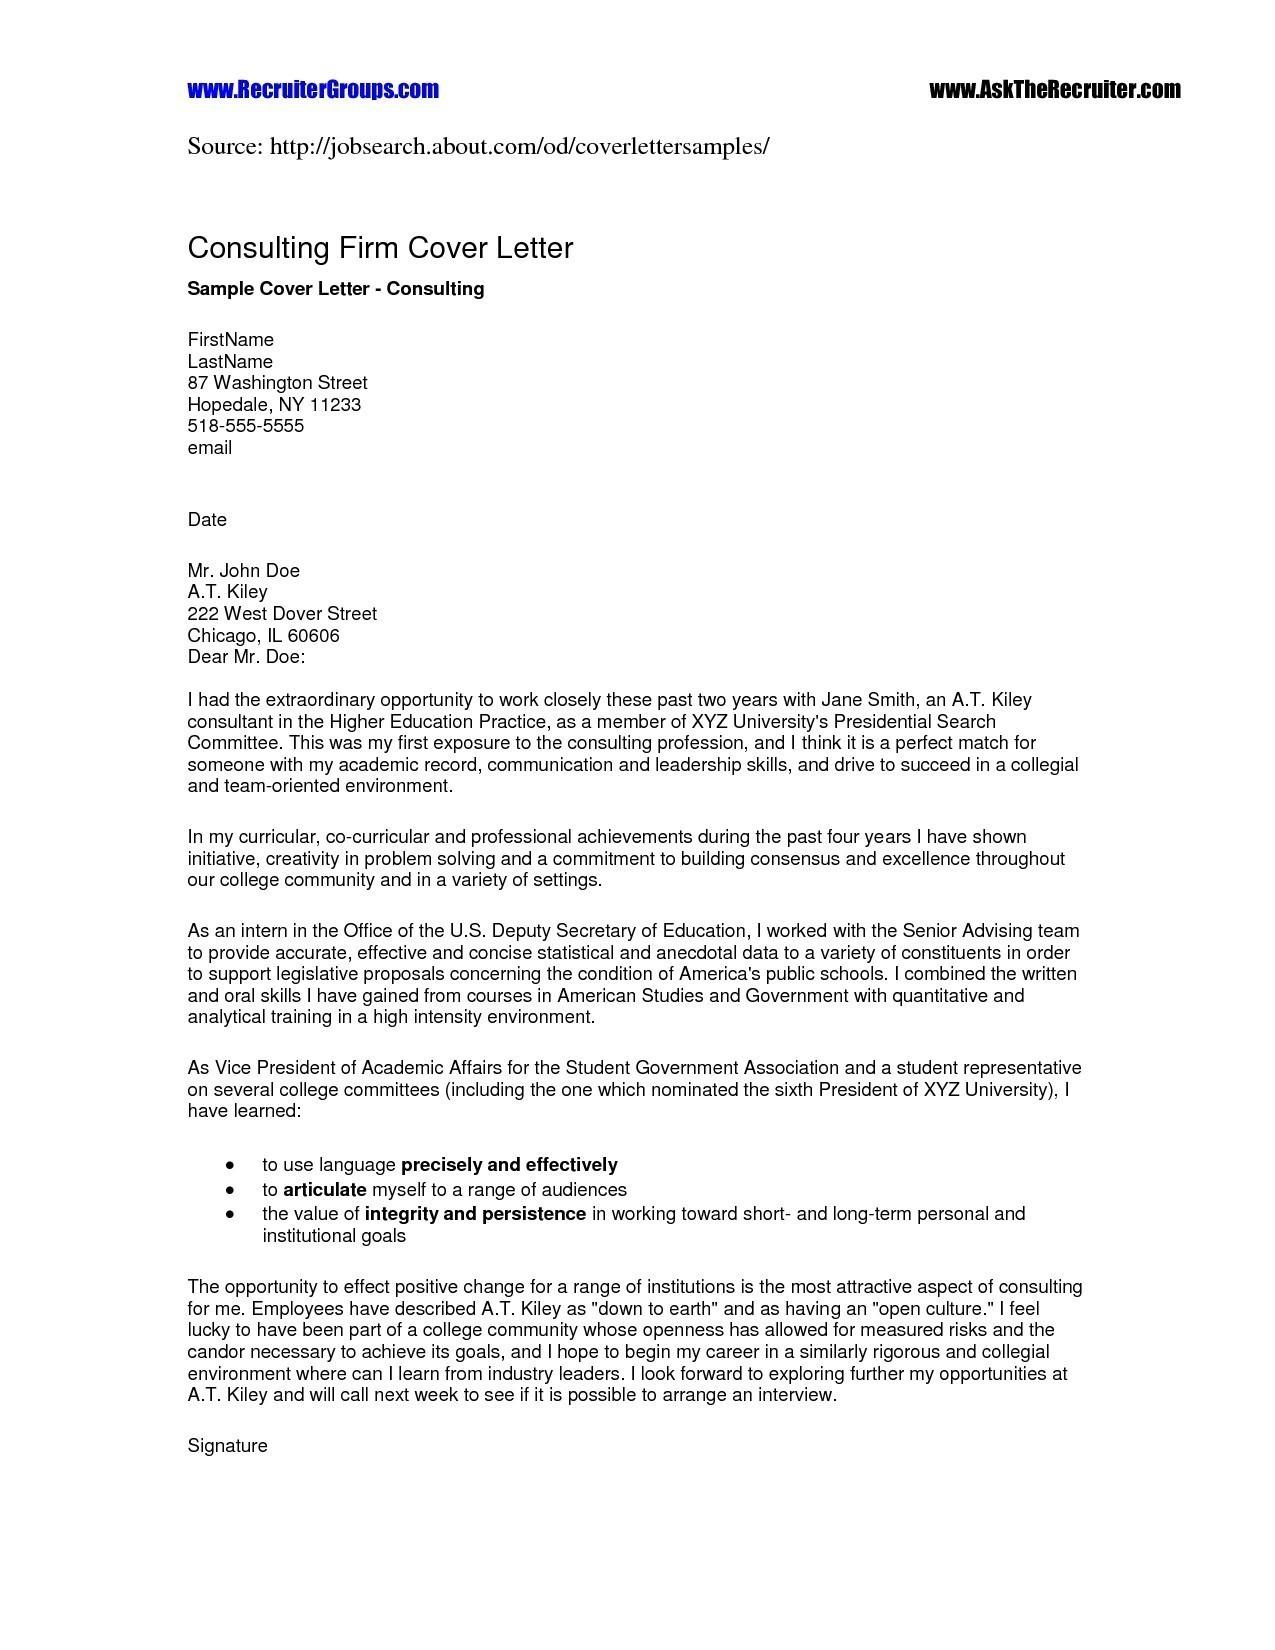 Employment Verification Letter Free Template - Sample Job Verification Letter Refrence Job Application Letter